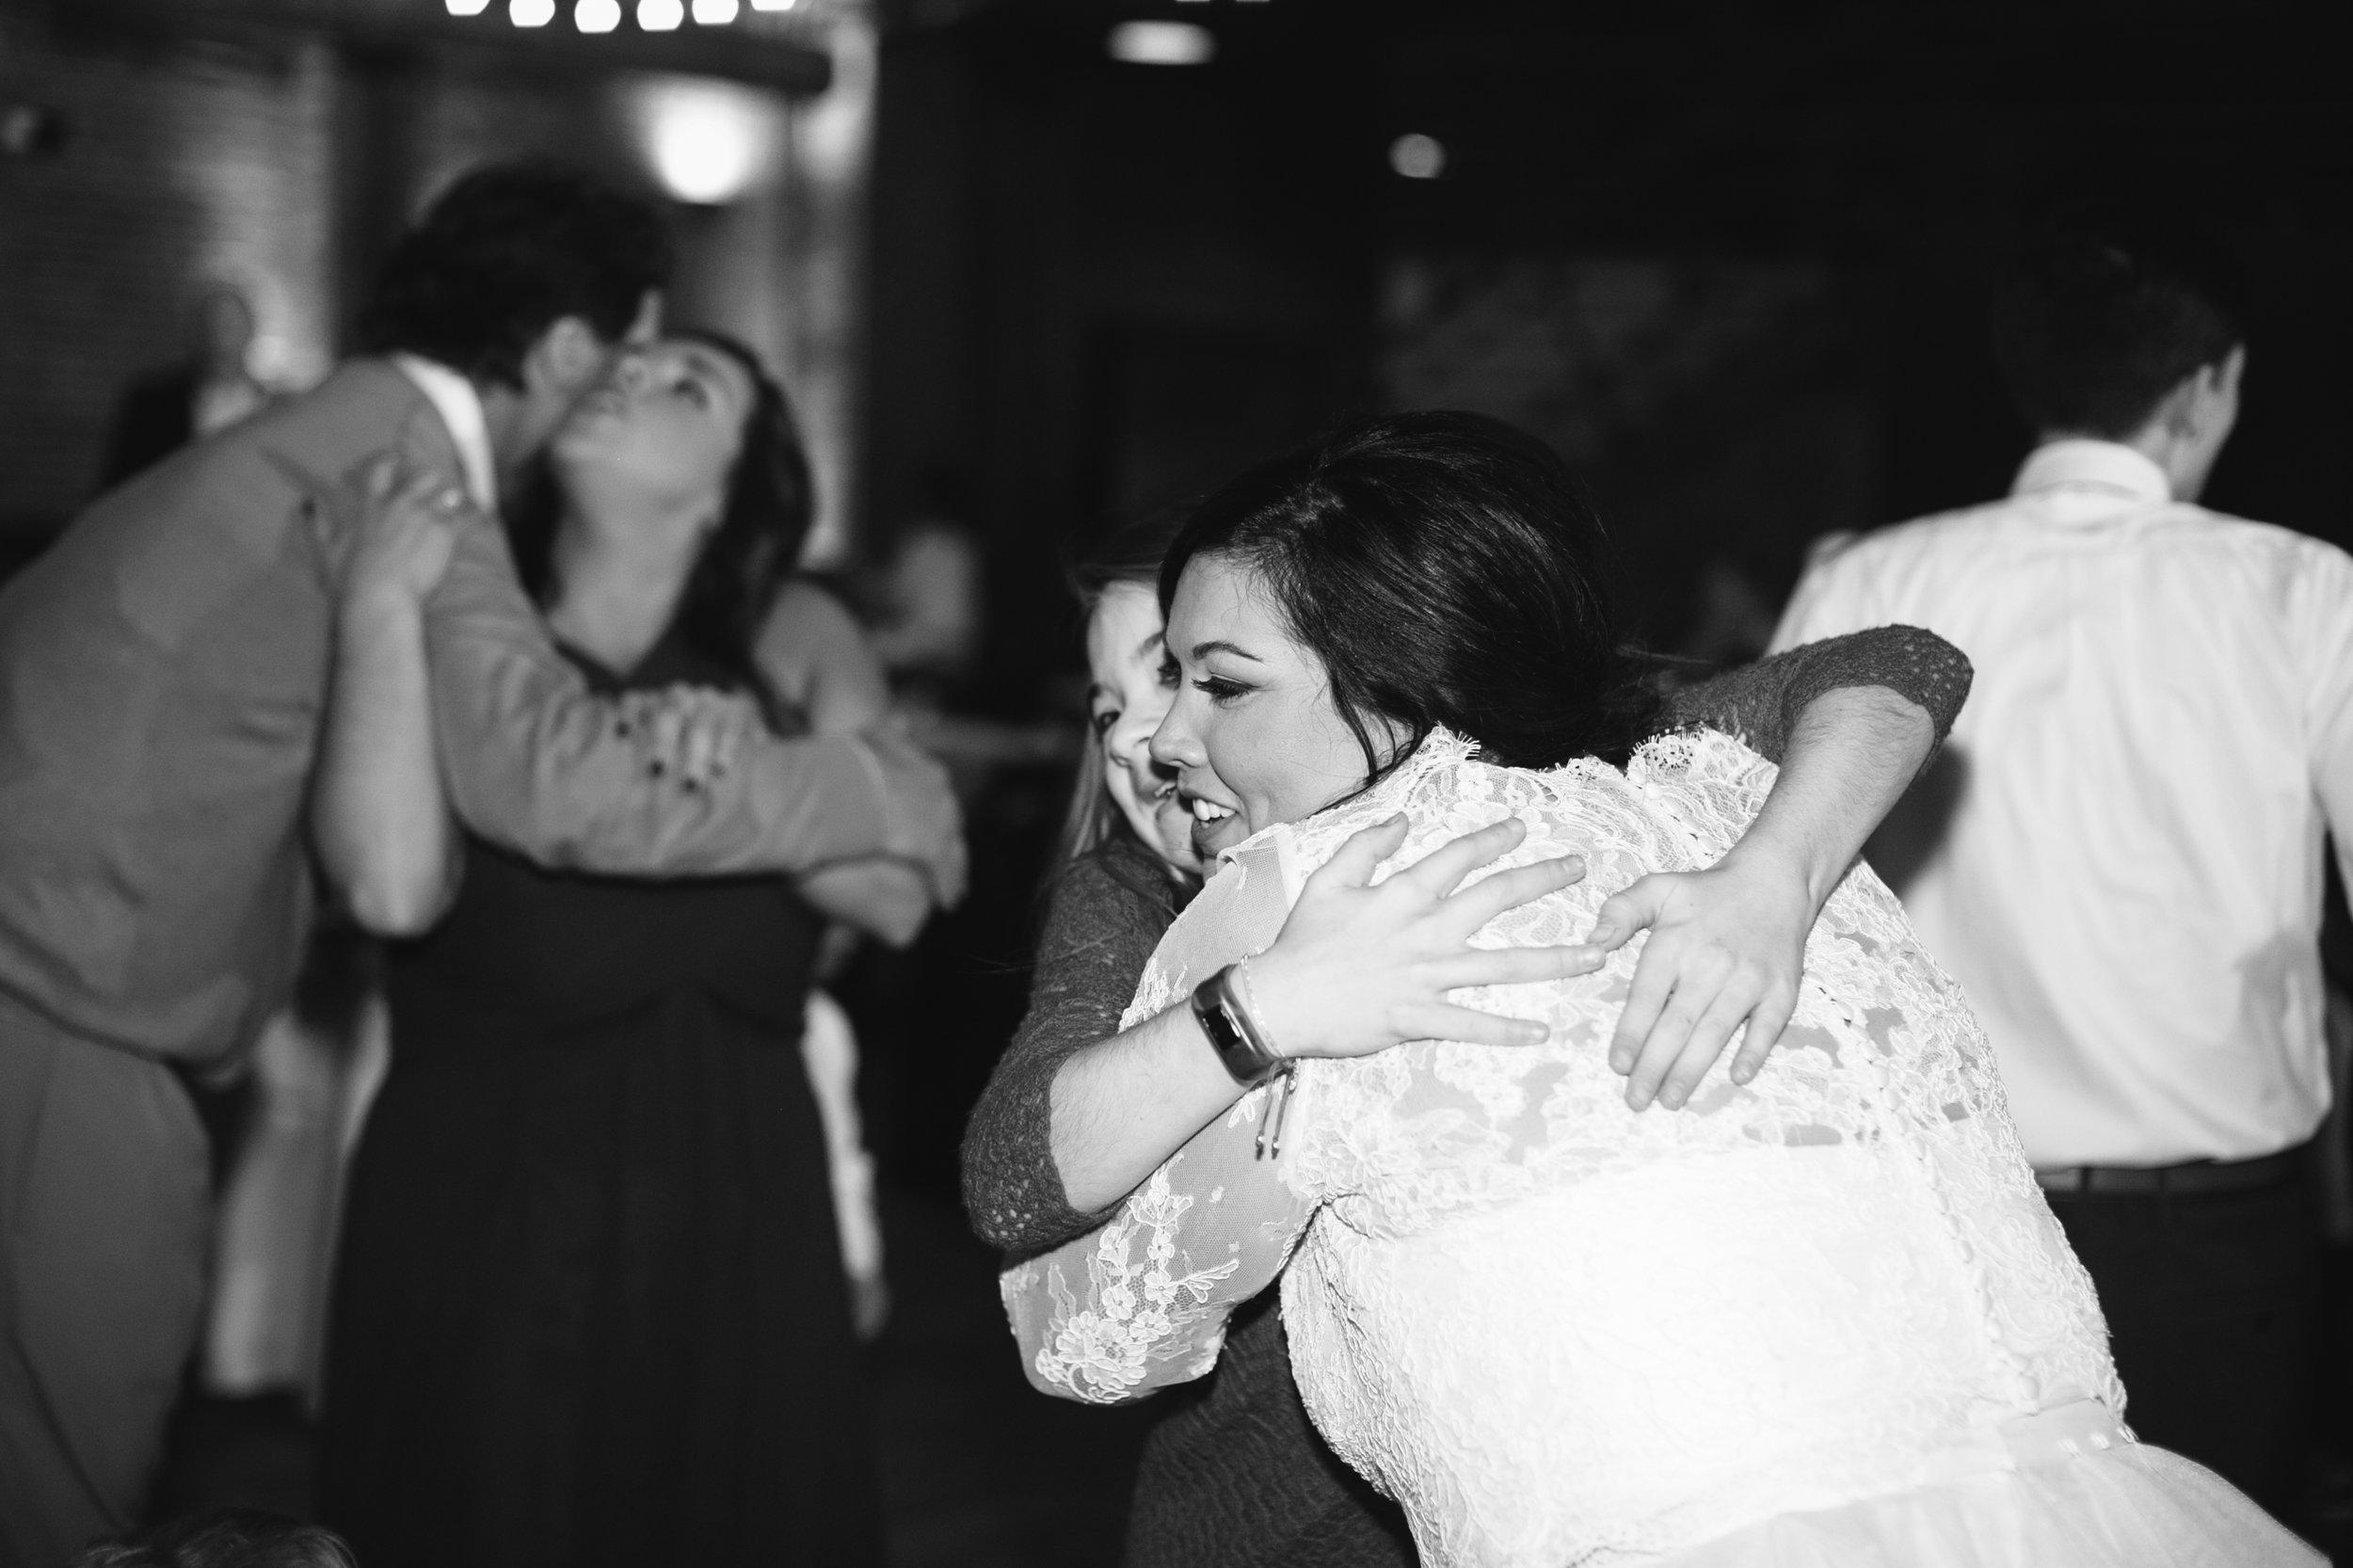 Lauren_Jeremy_Standard_Wedding_Knoxville_Abigail_Malone_Photography_FIlm-580.jpg